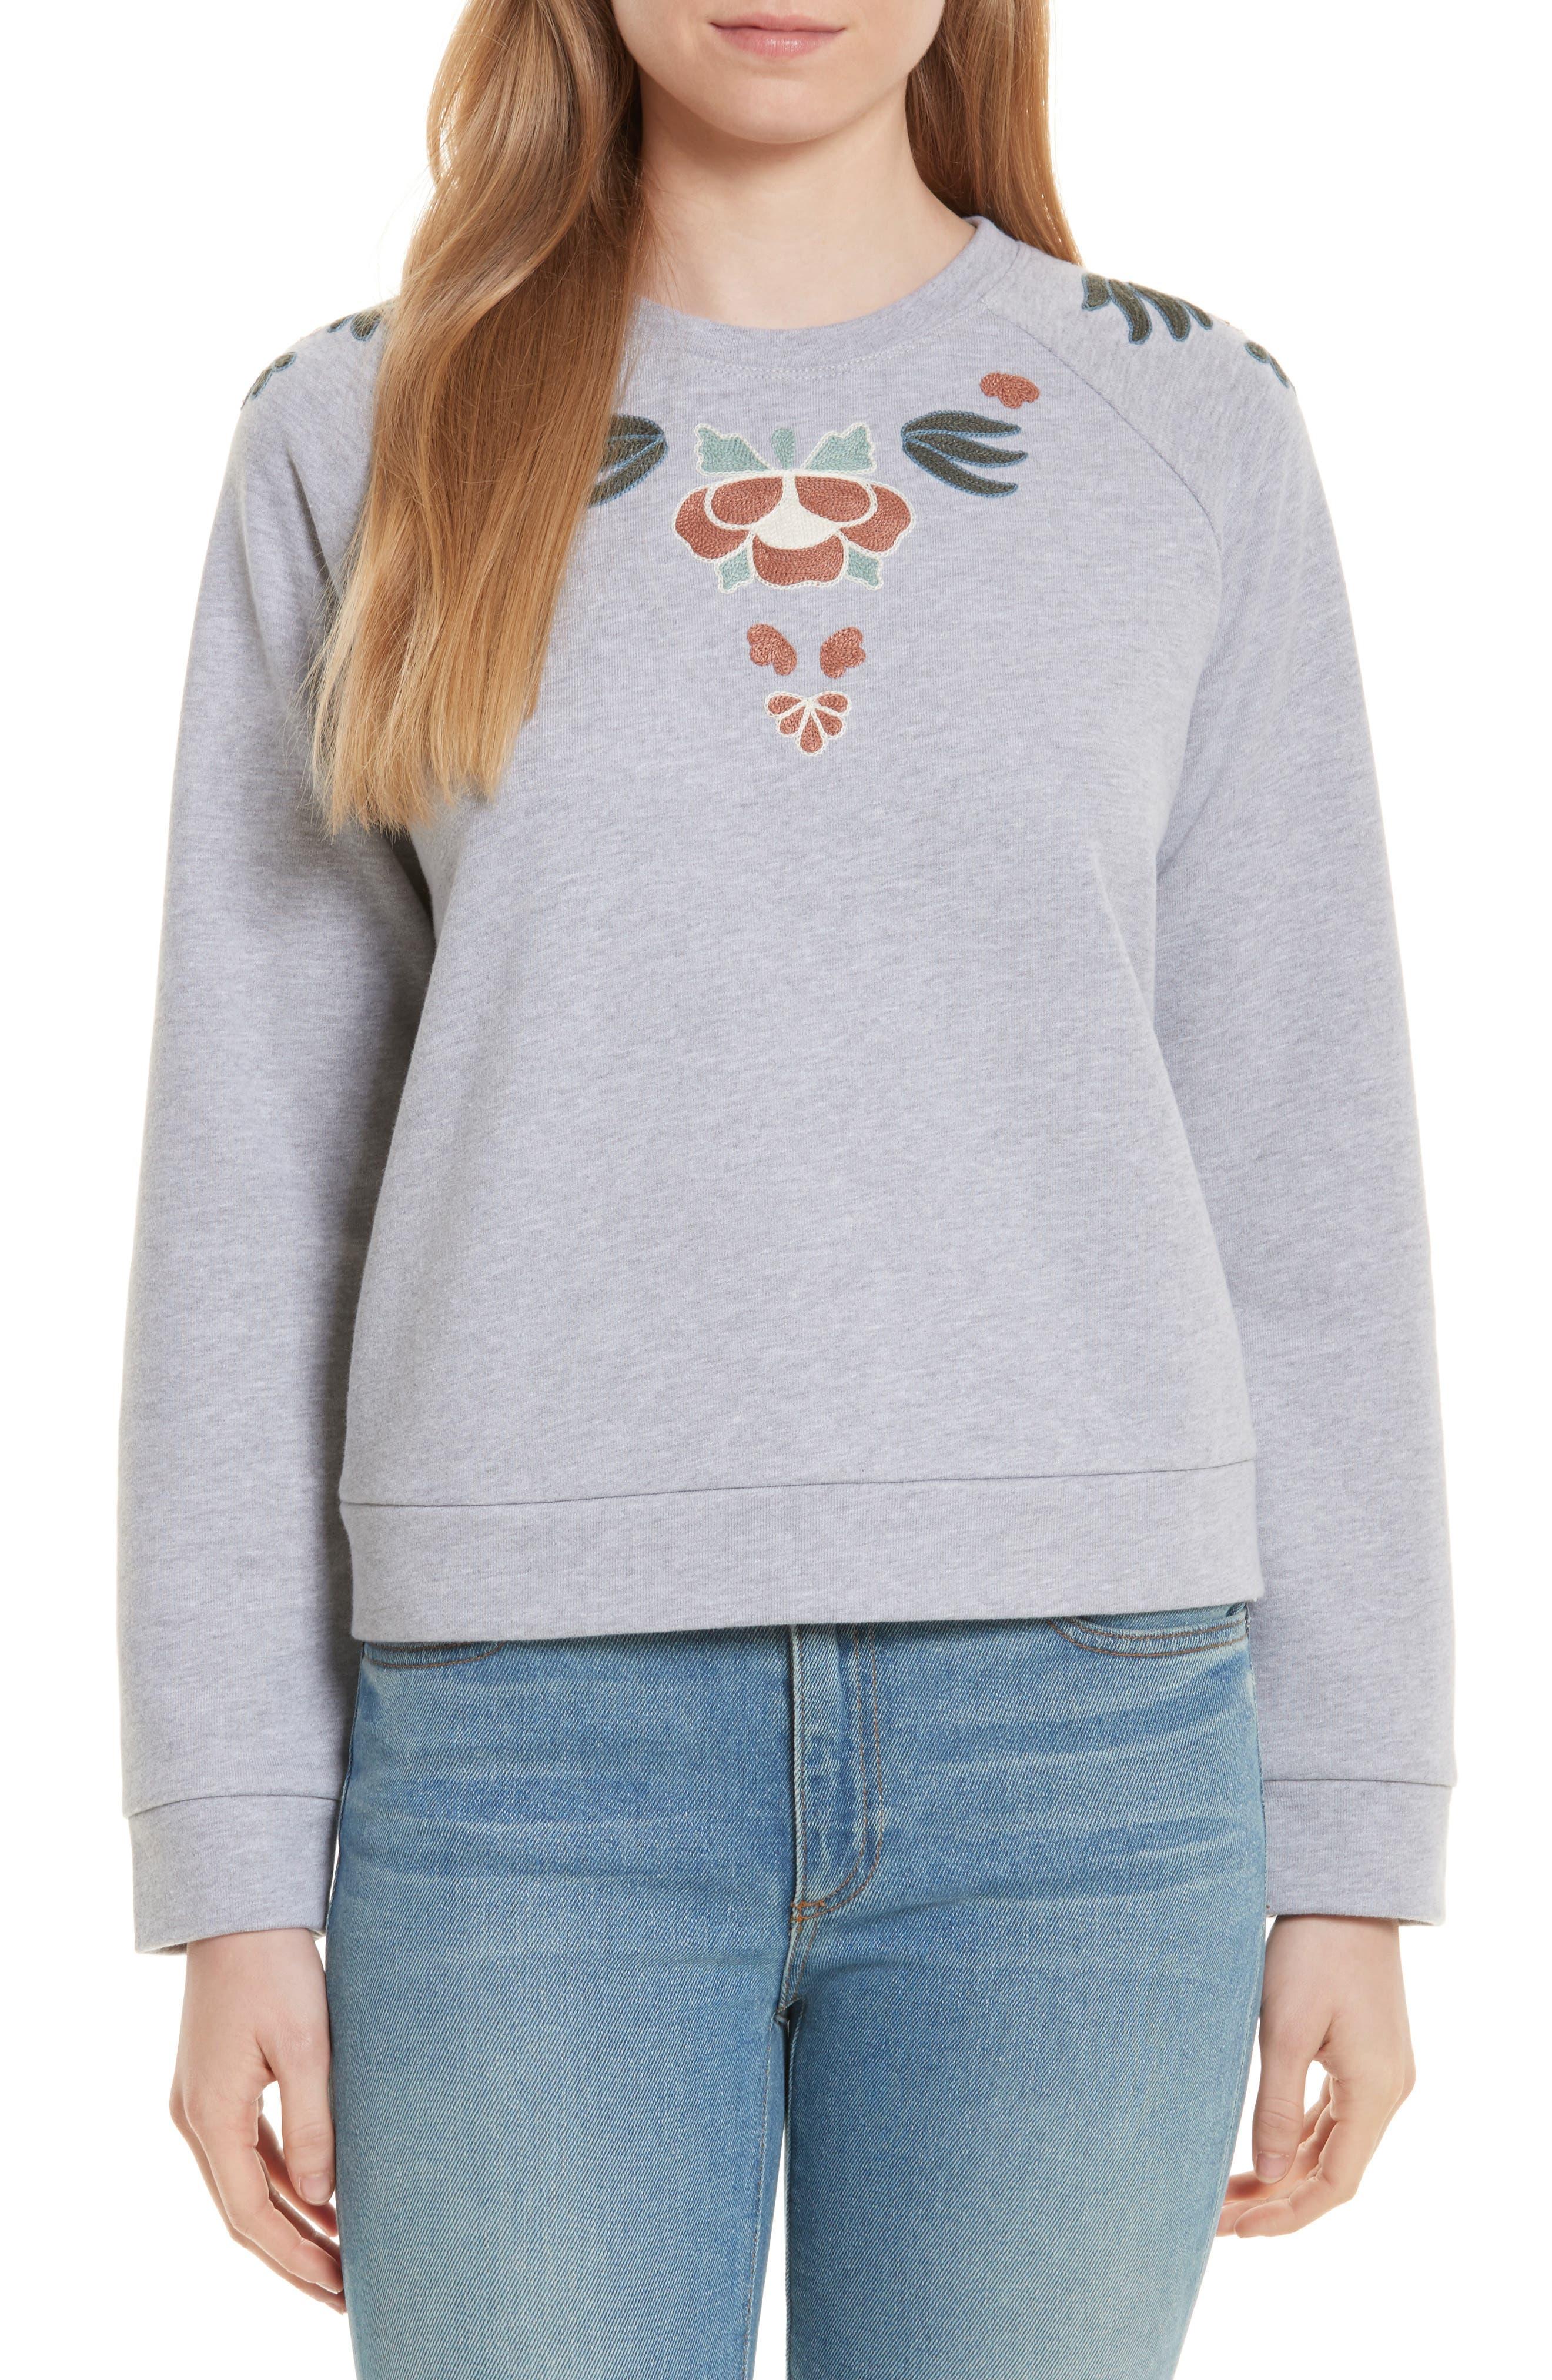 Jennings Embroidered Sweatshirt,                             Main thumbnail 1, color,                             Heather Grey